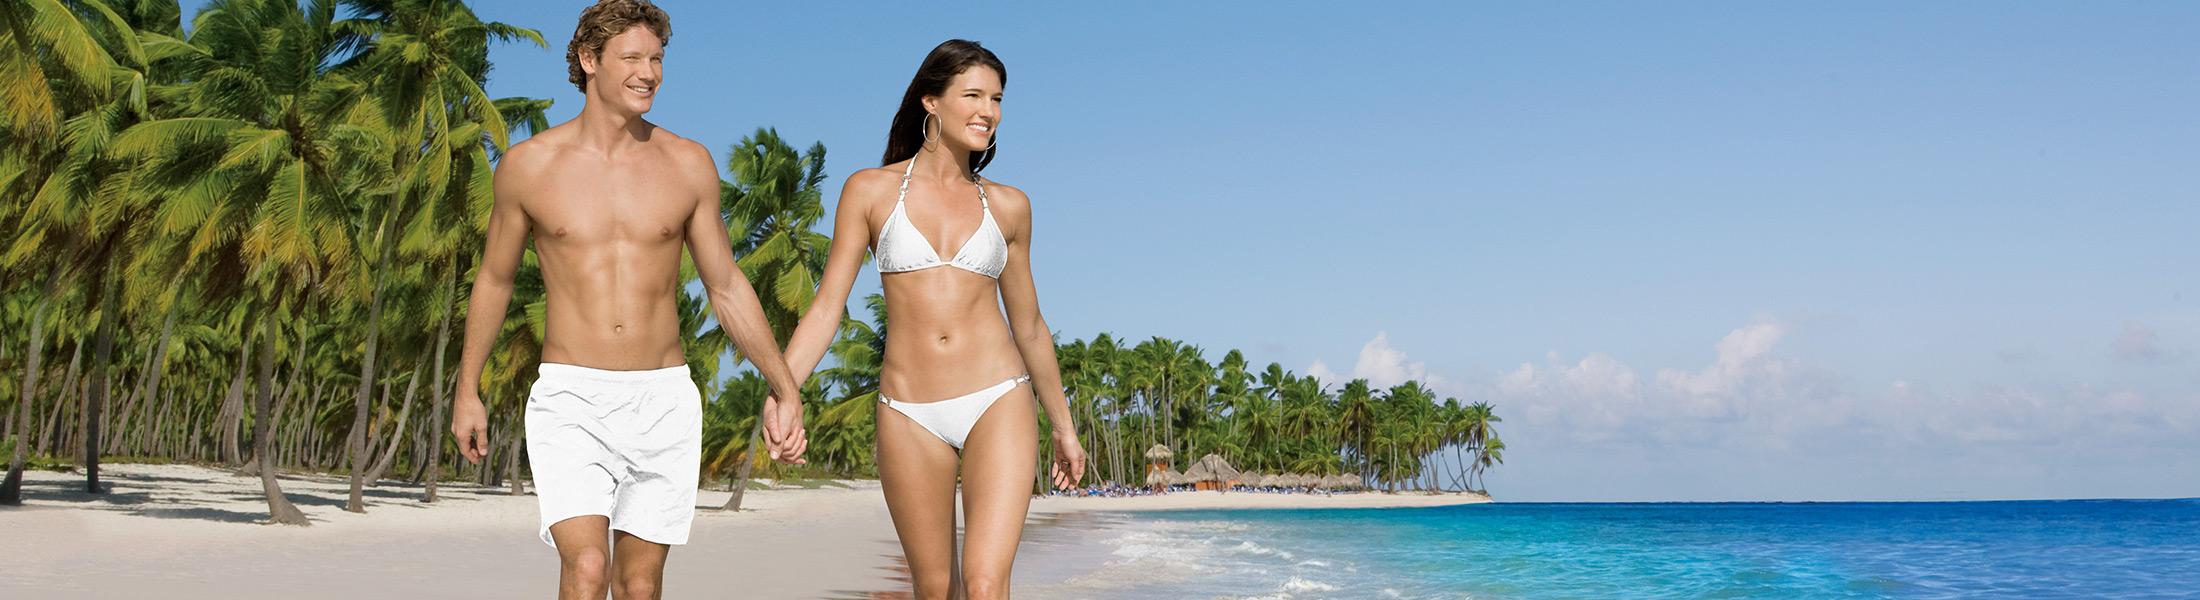 Couple walking long hotel beach at the Dreams Palm Beach Punta Cana